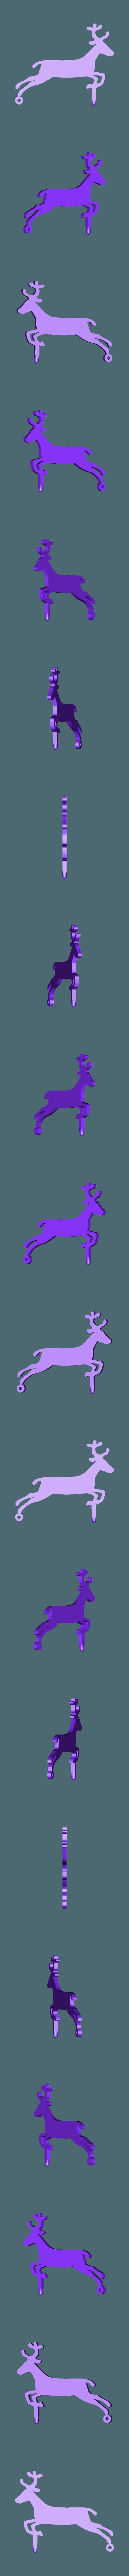 Reindeer.stl Télécharger fichier STL gratuit Santa Whirligig • Objet pour imprimante 3D, Sparky6548